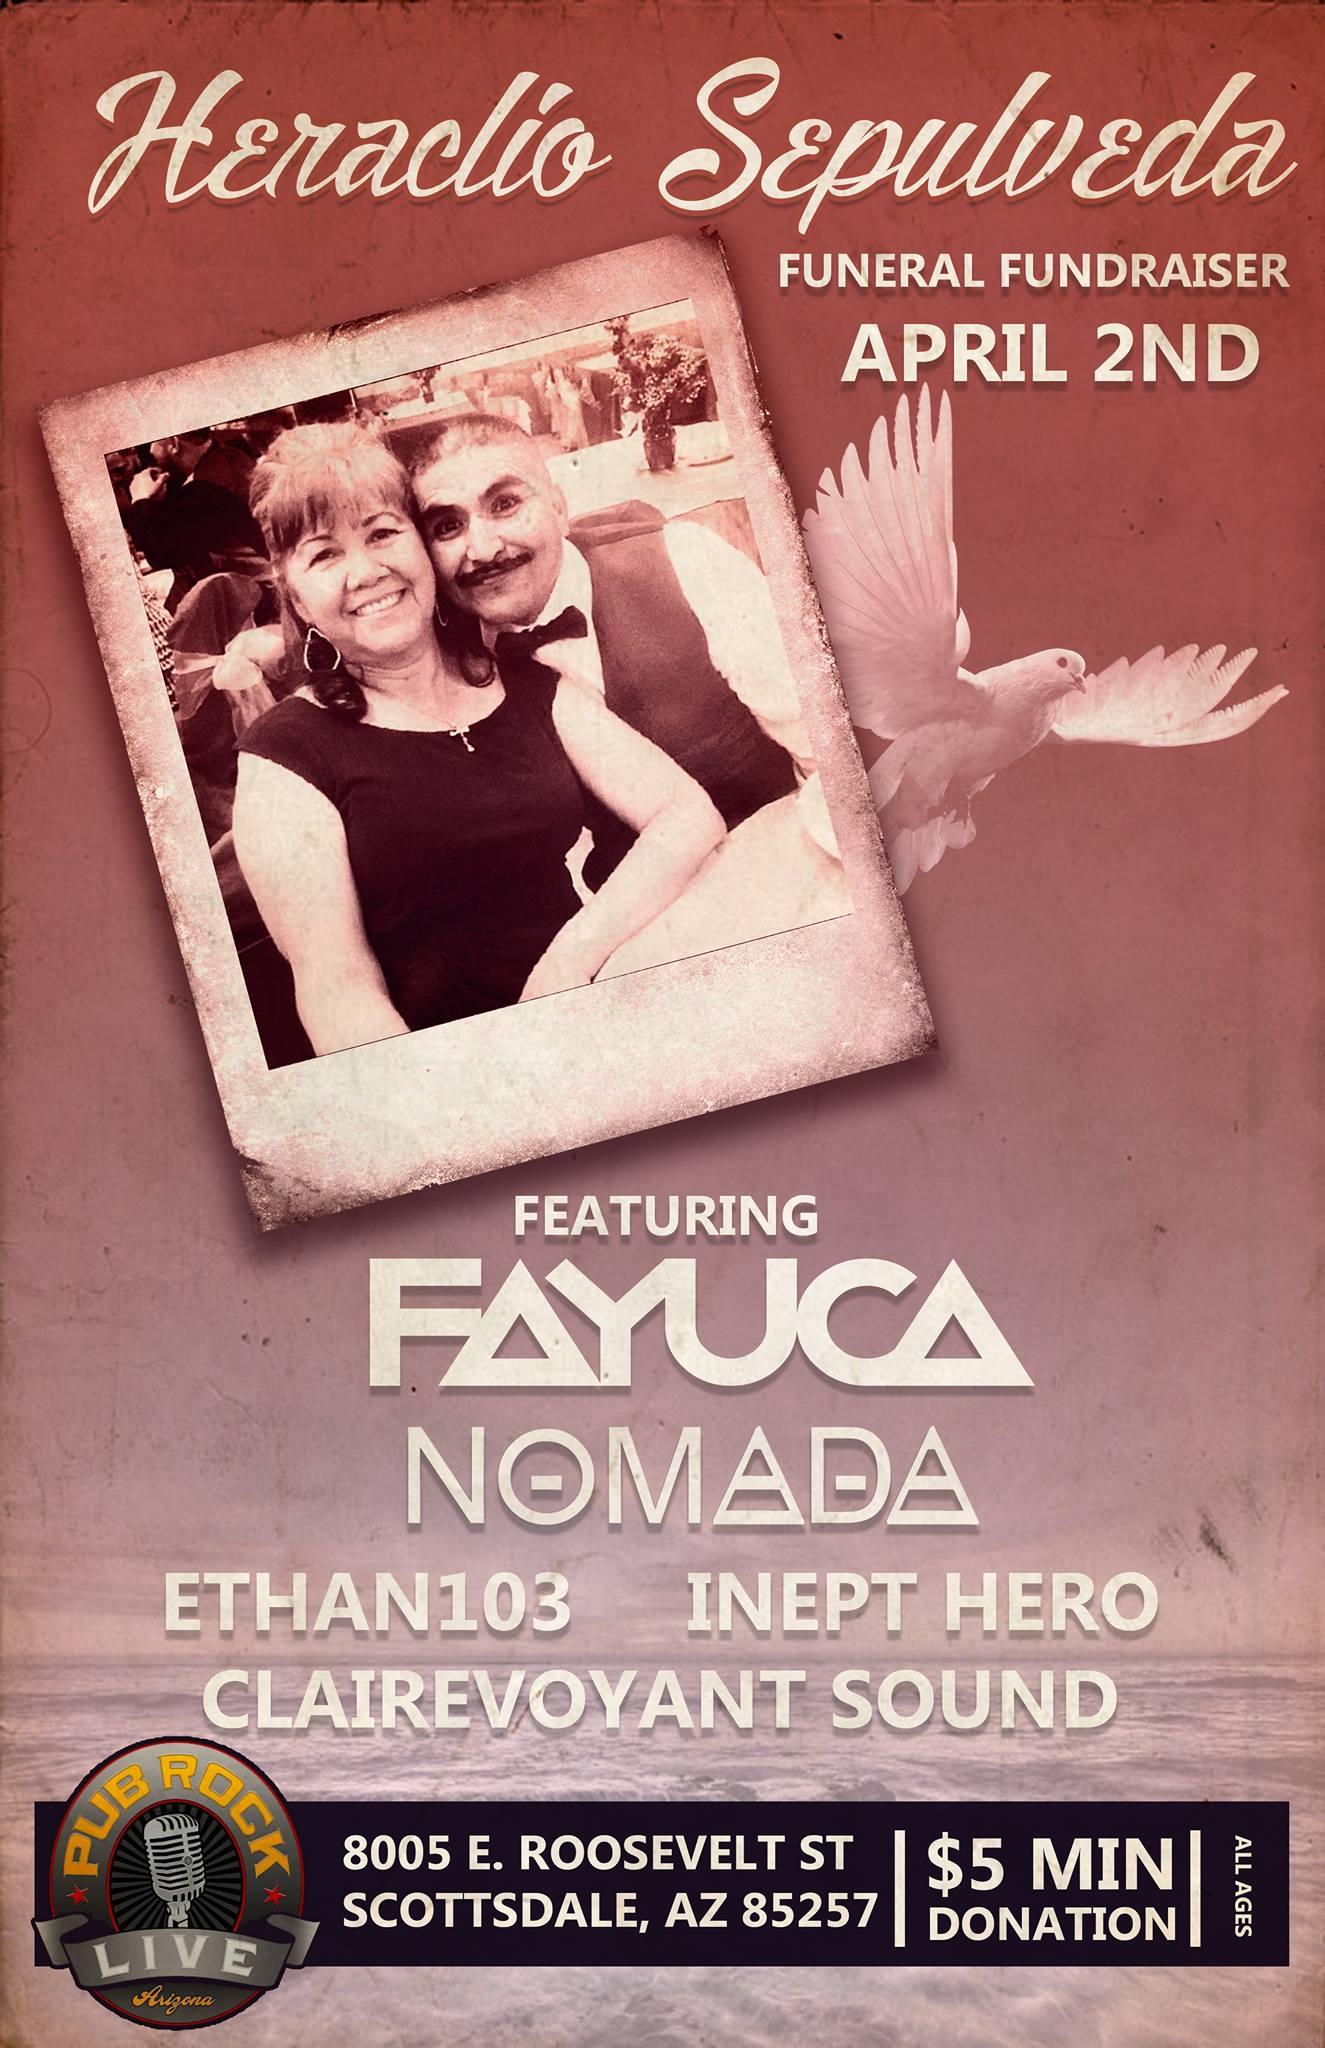 Scottsdale, AZ – LACO Funeral Fundraiser Feat. Fayuca/Nomada